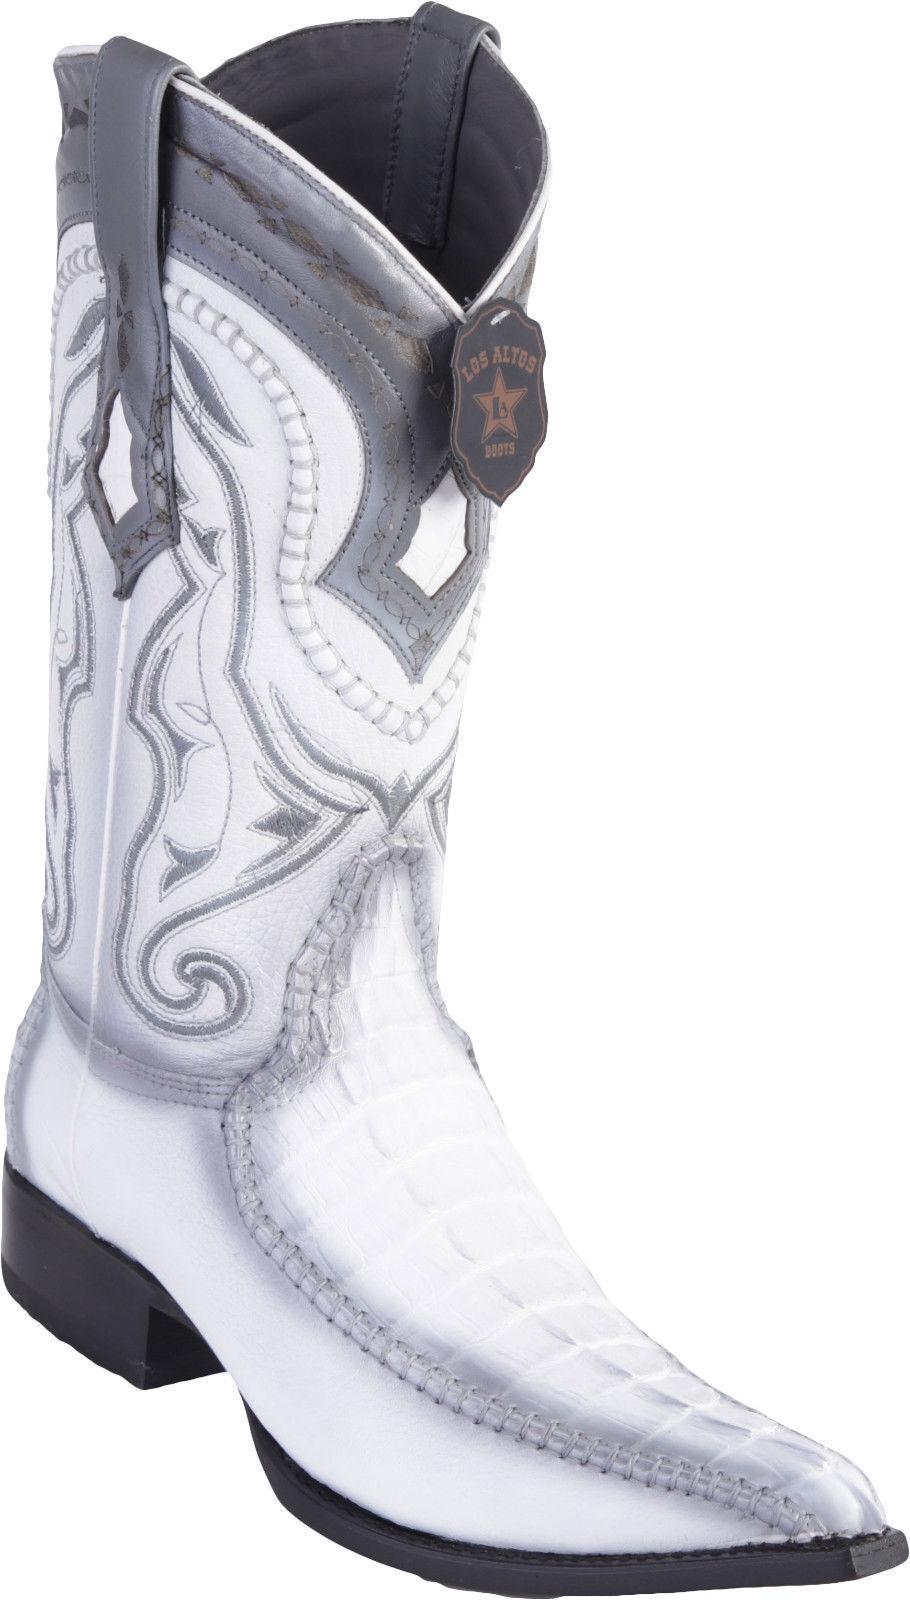 Los Altos Genuine WHITE WHITE WHITE Caiman CROCODILE Tail 3x Toe Western Cowboy Boot EE 753105